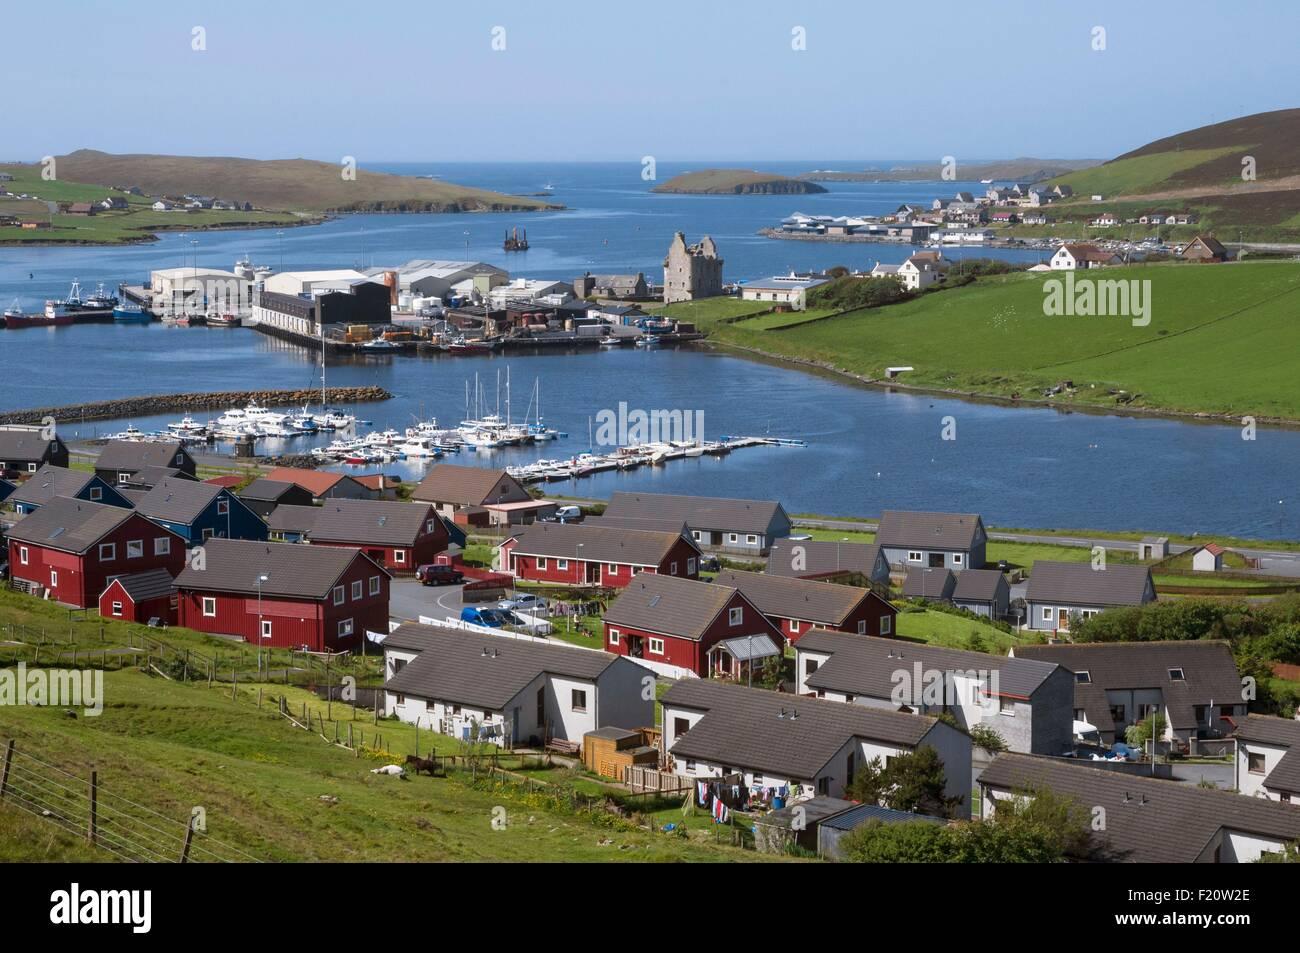 United Kingdom, Scotland, Shetland islands, Central Mainland, Scalloway old capital - Stock Image